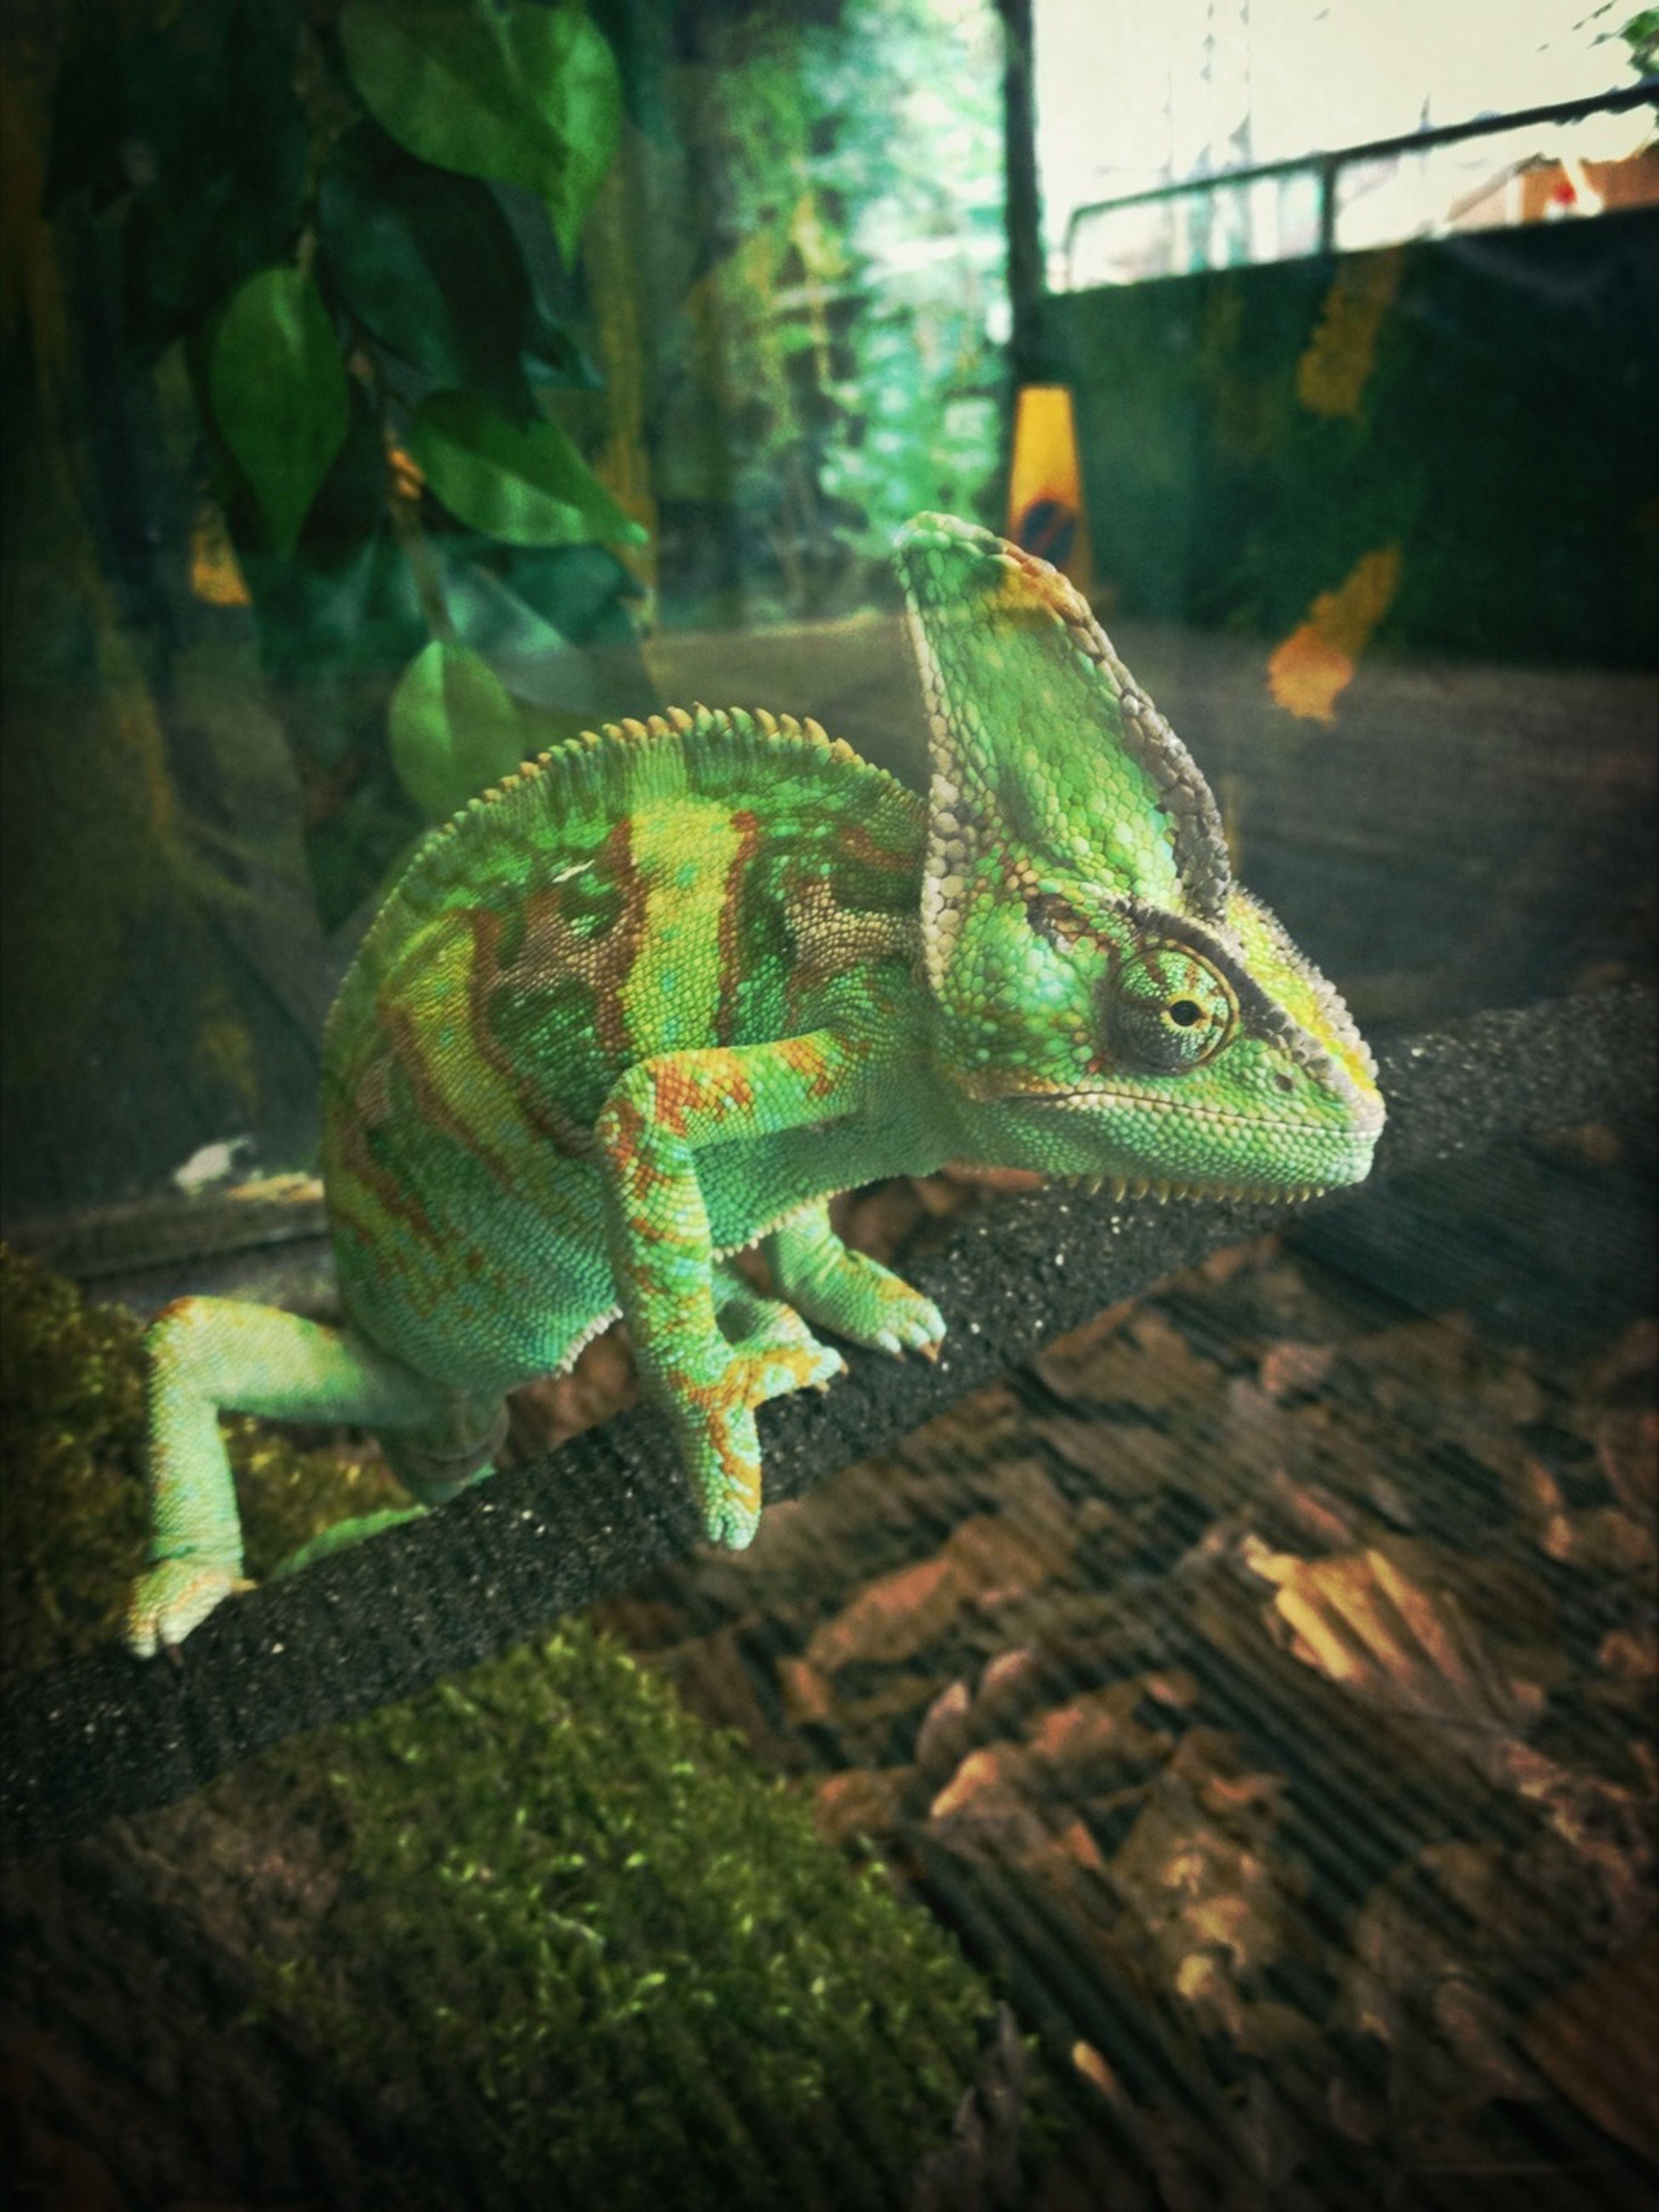 Little Green Friend